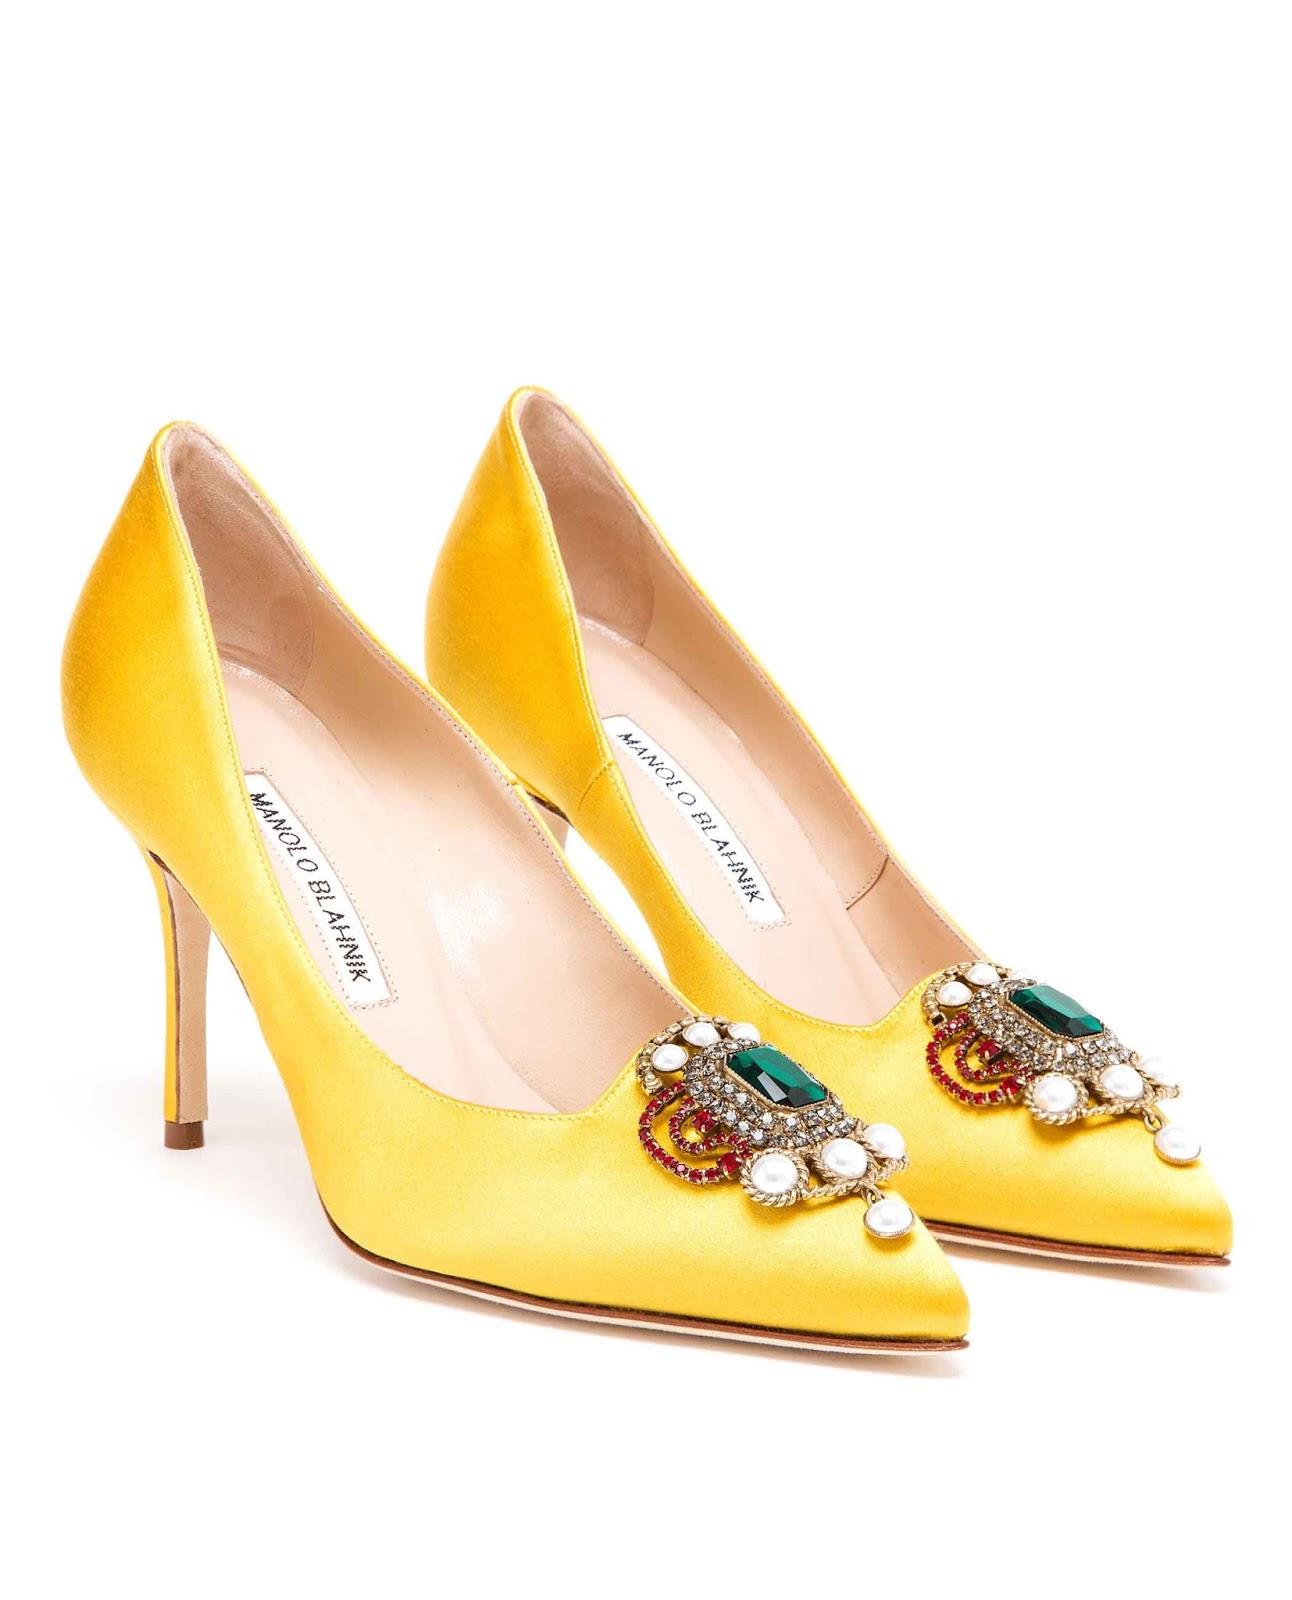 Flat Shoes Bagus Merk Apa